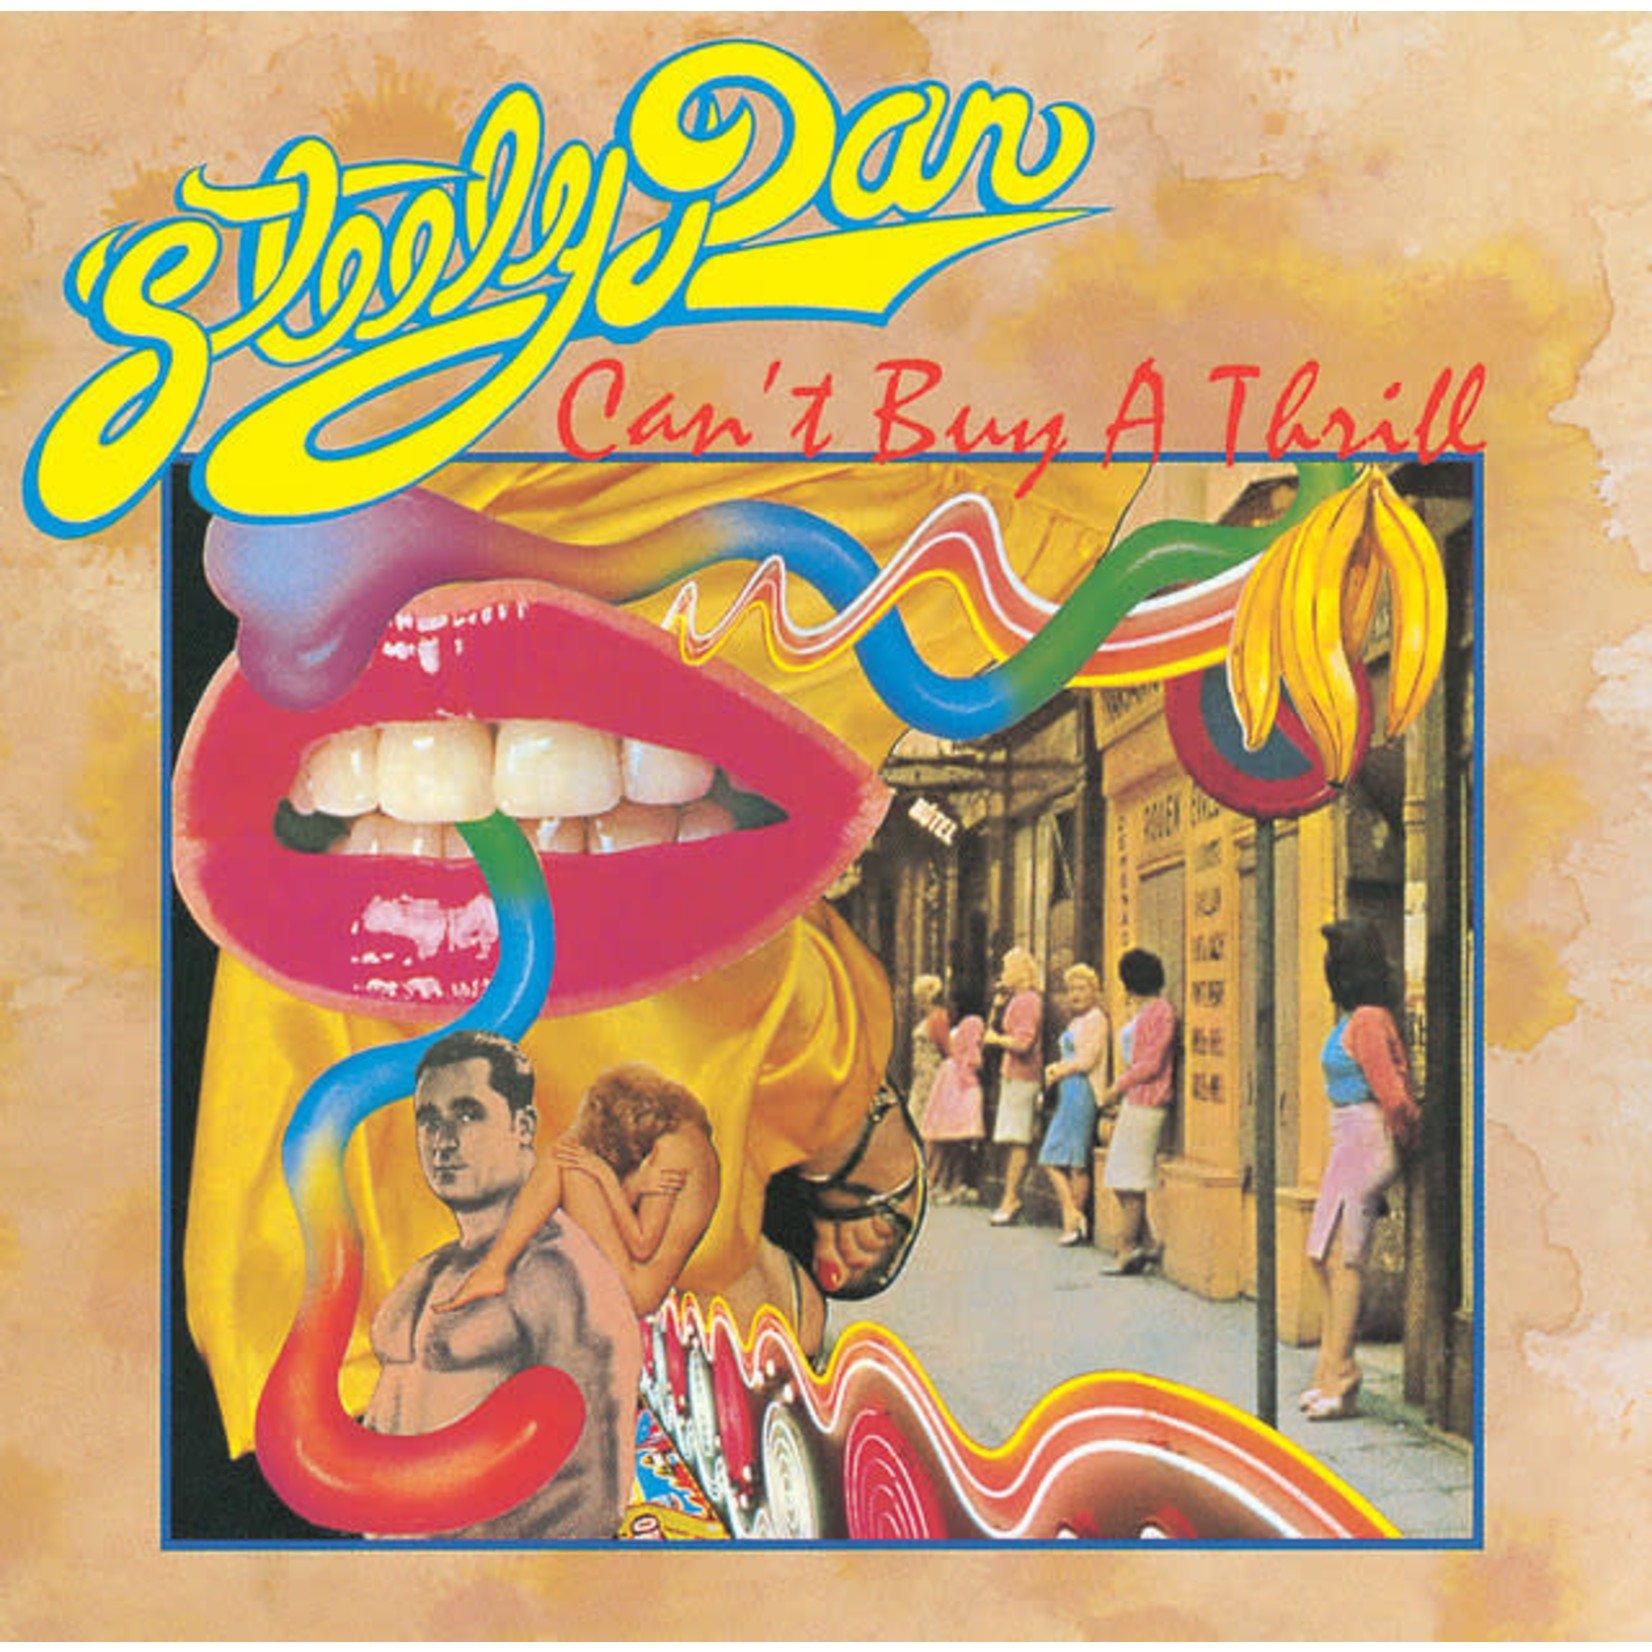 Vinyl Steely Dan - Can't Buy A Thrill (Yellow Vinyl) - (Used)